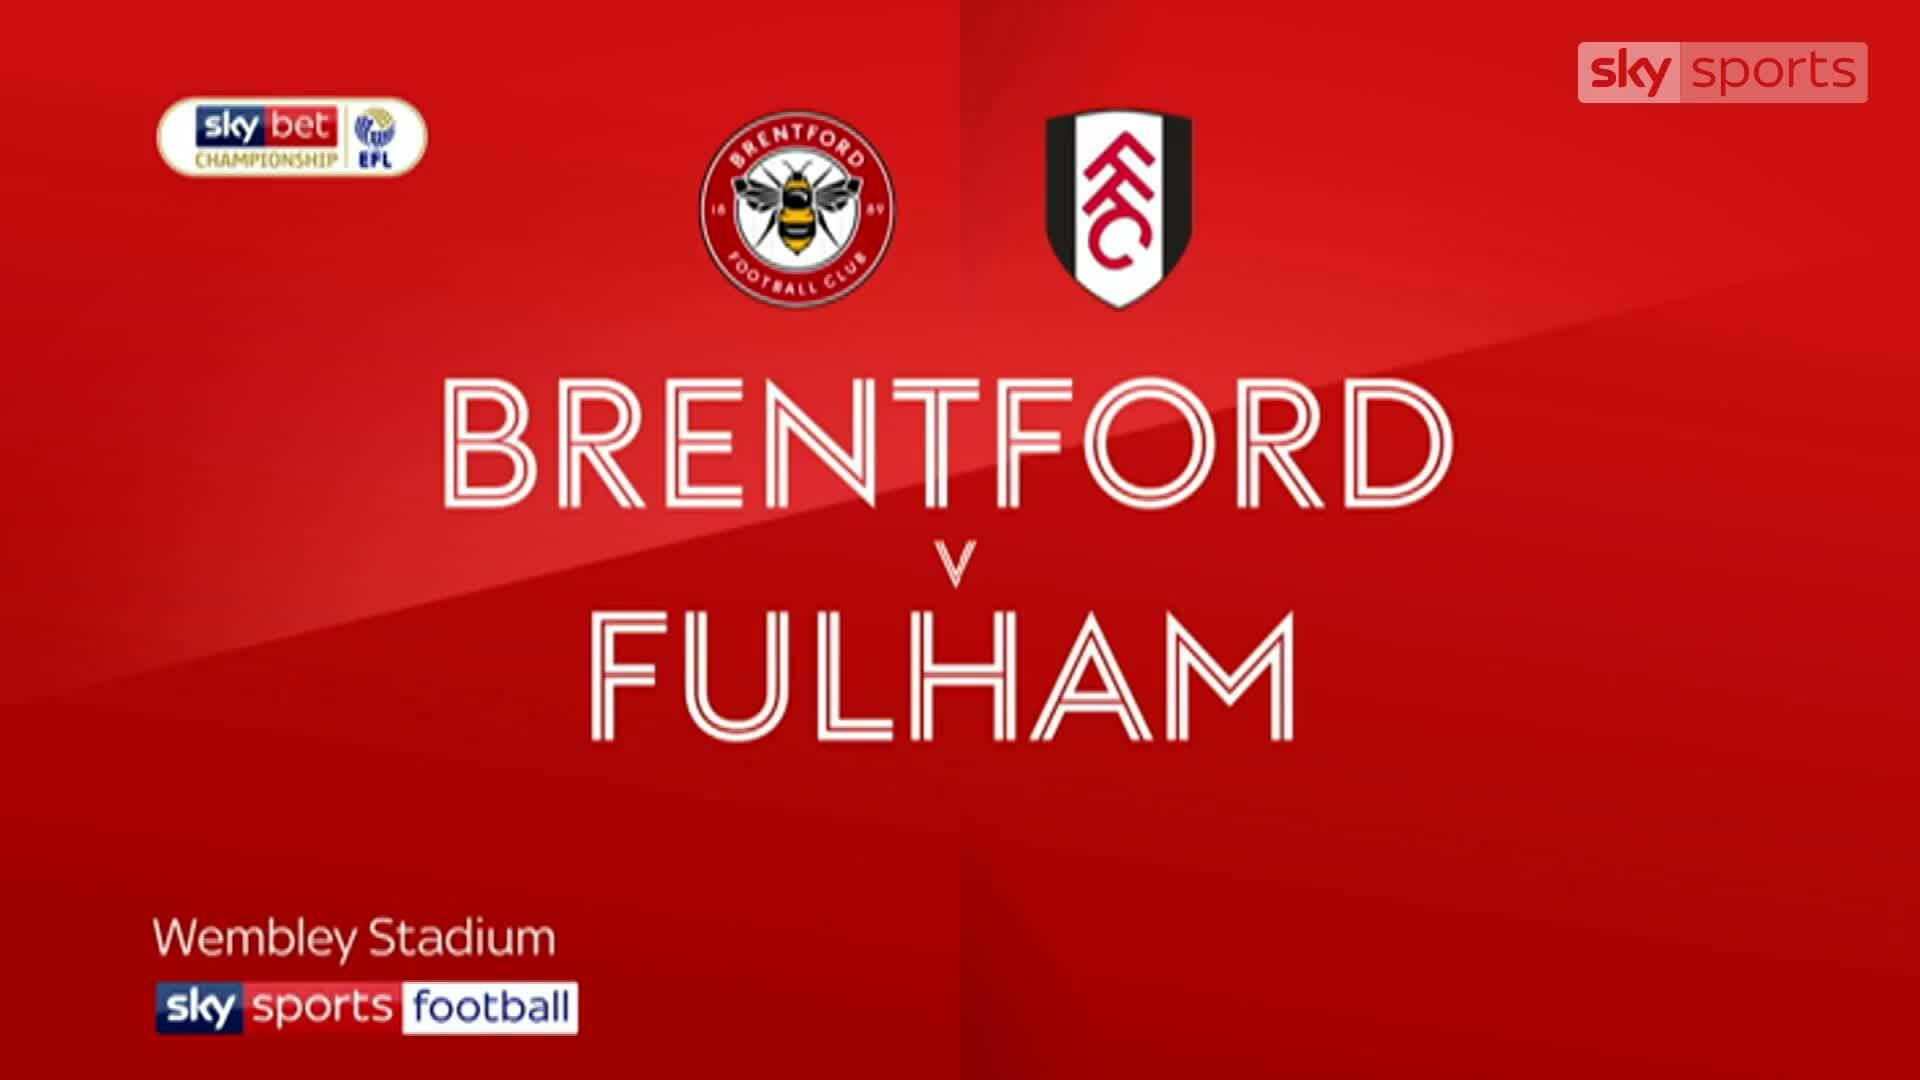 Brentford 1-2 Fulham